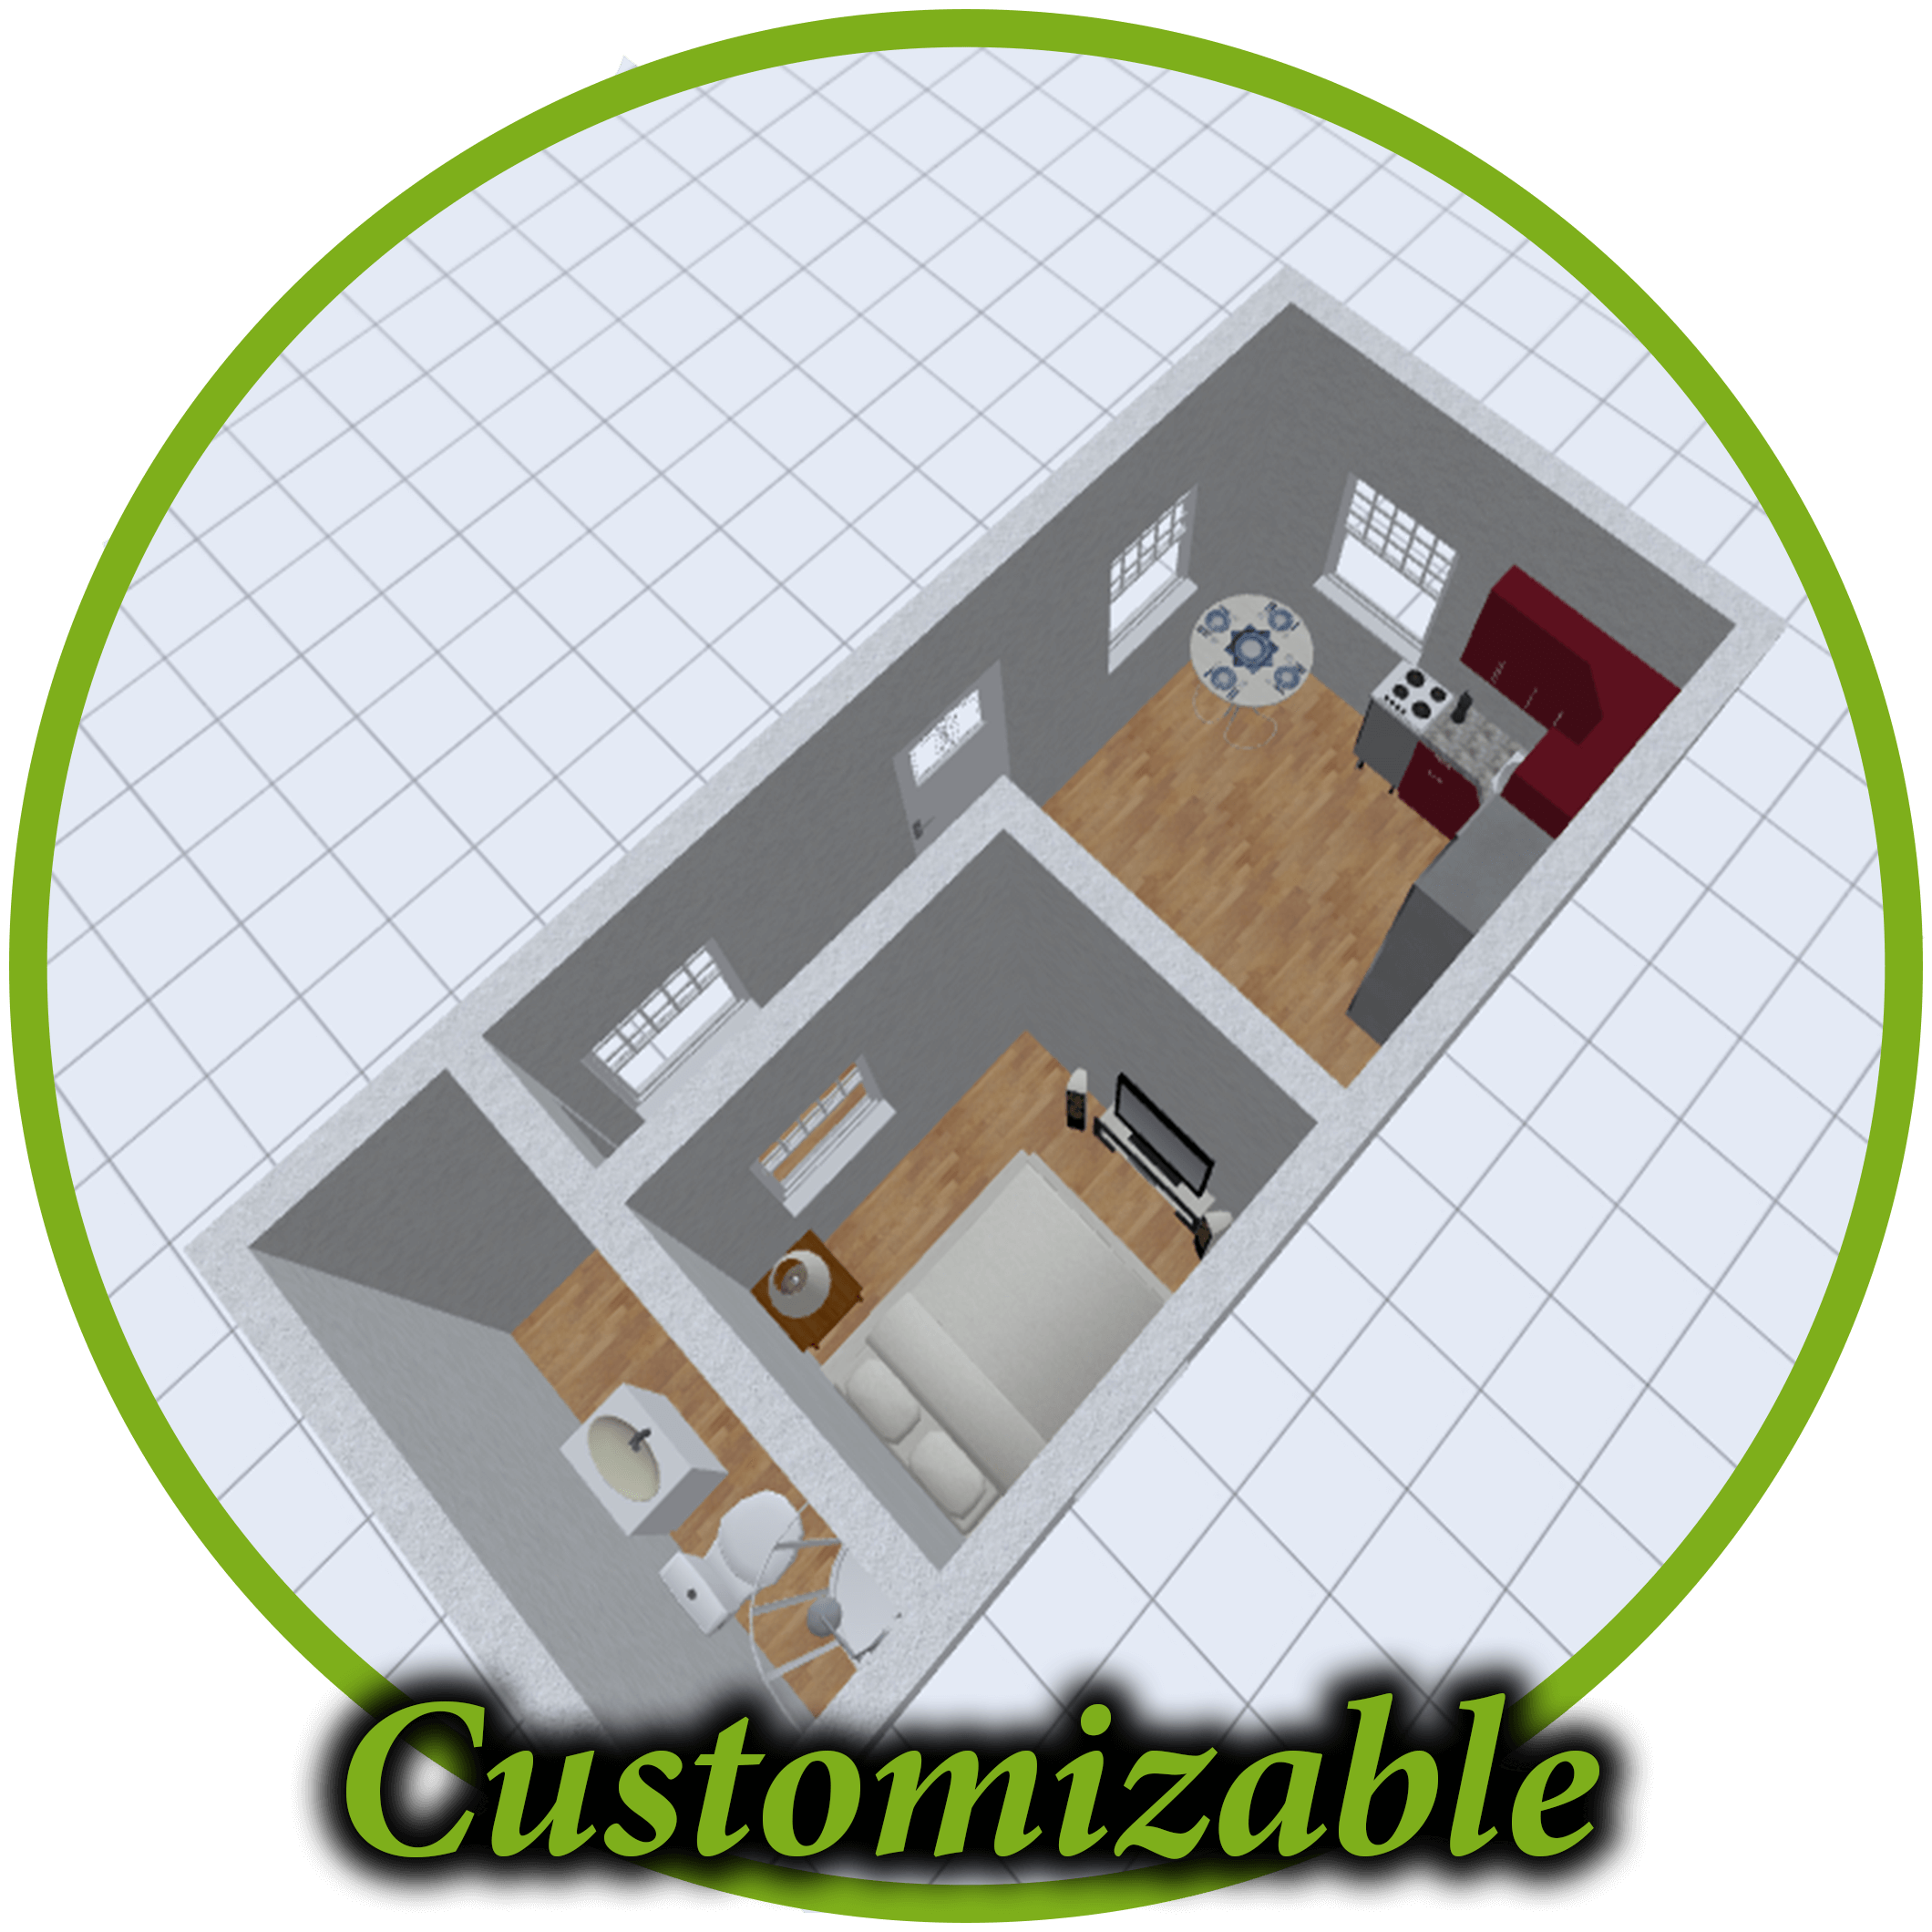 customizable.png